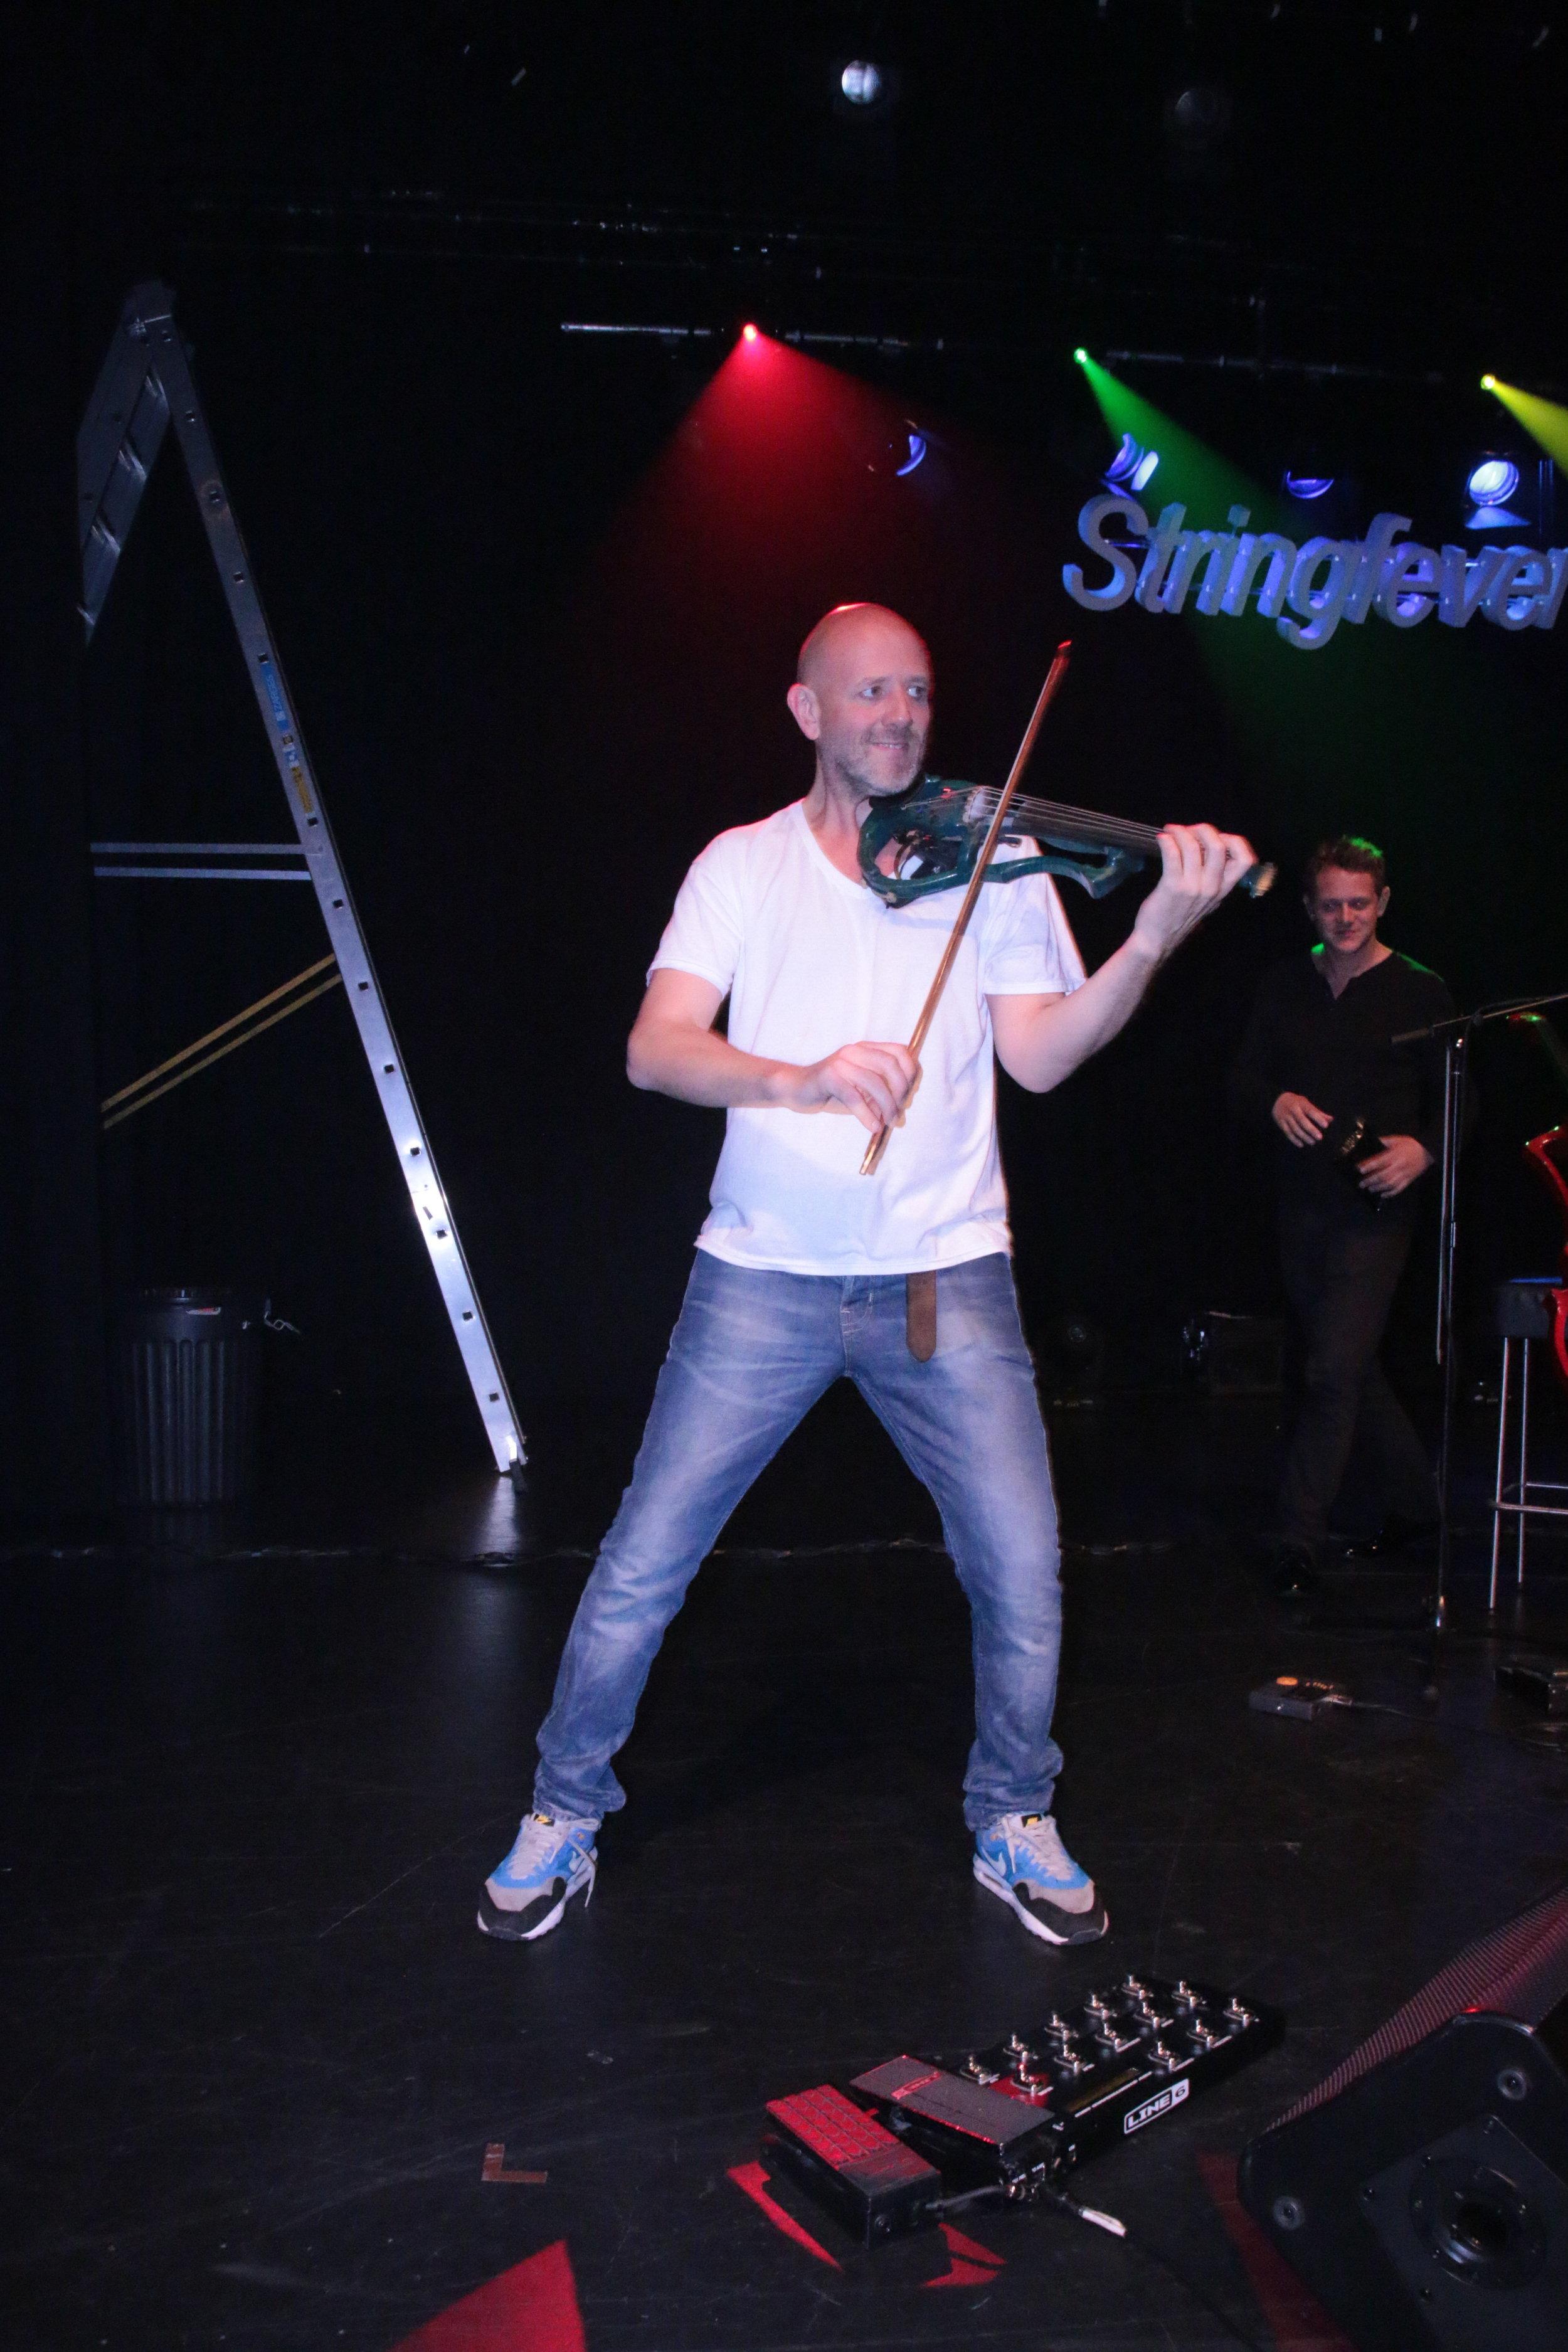 Giles Broadbent stringfever sound check.JPG